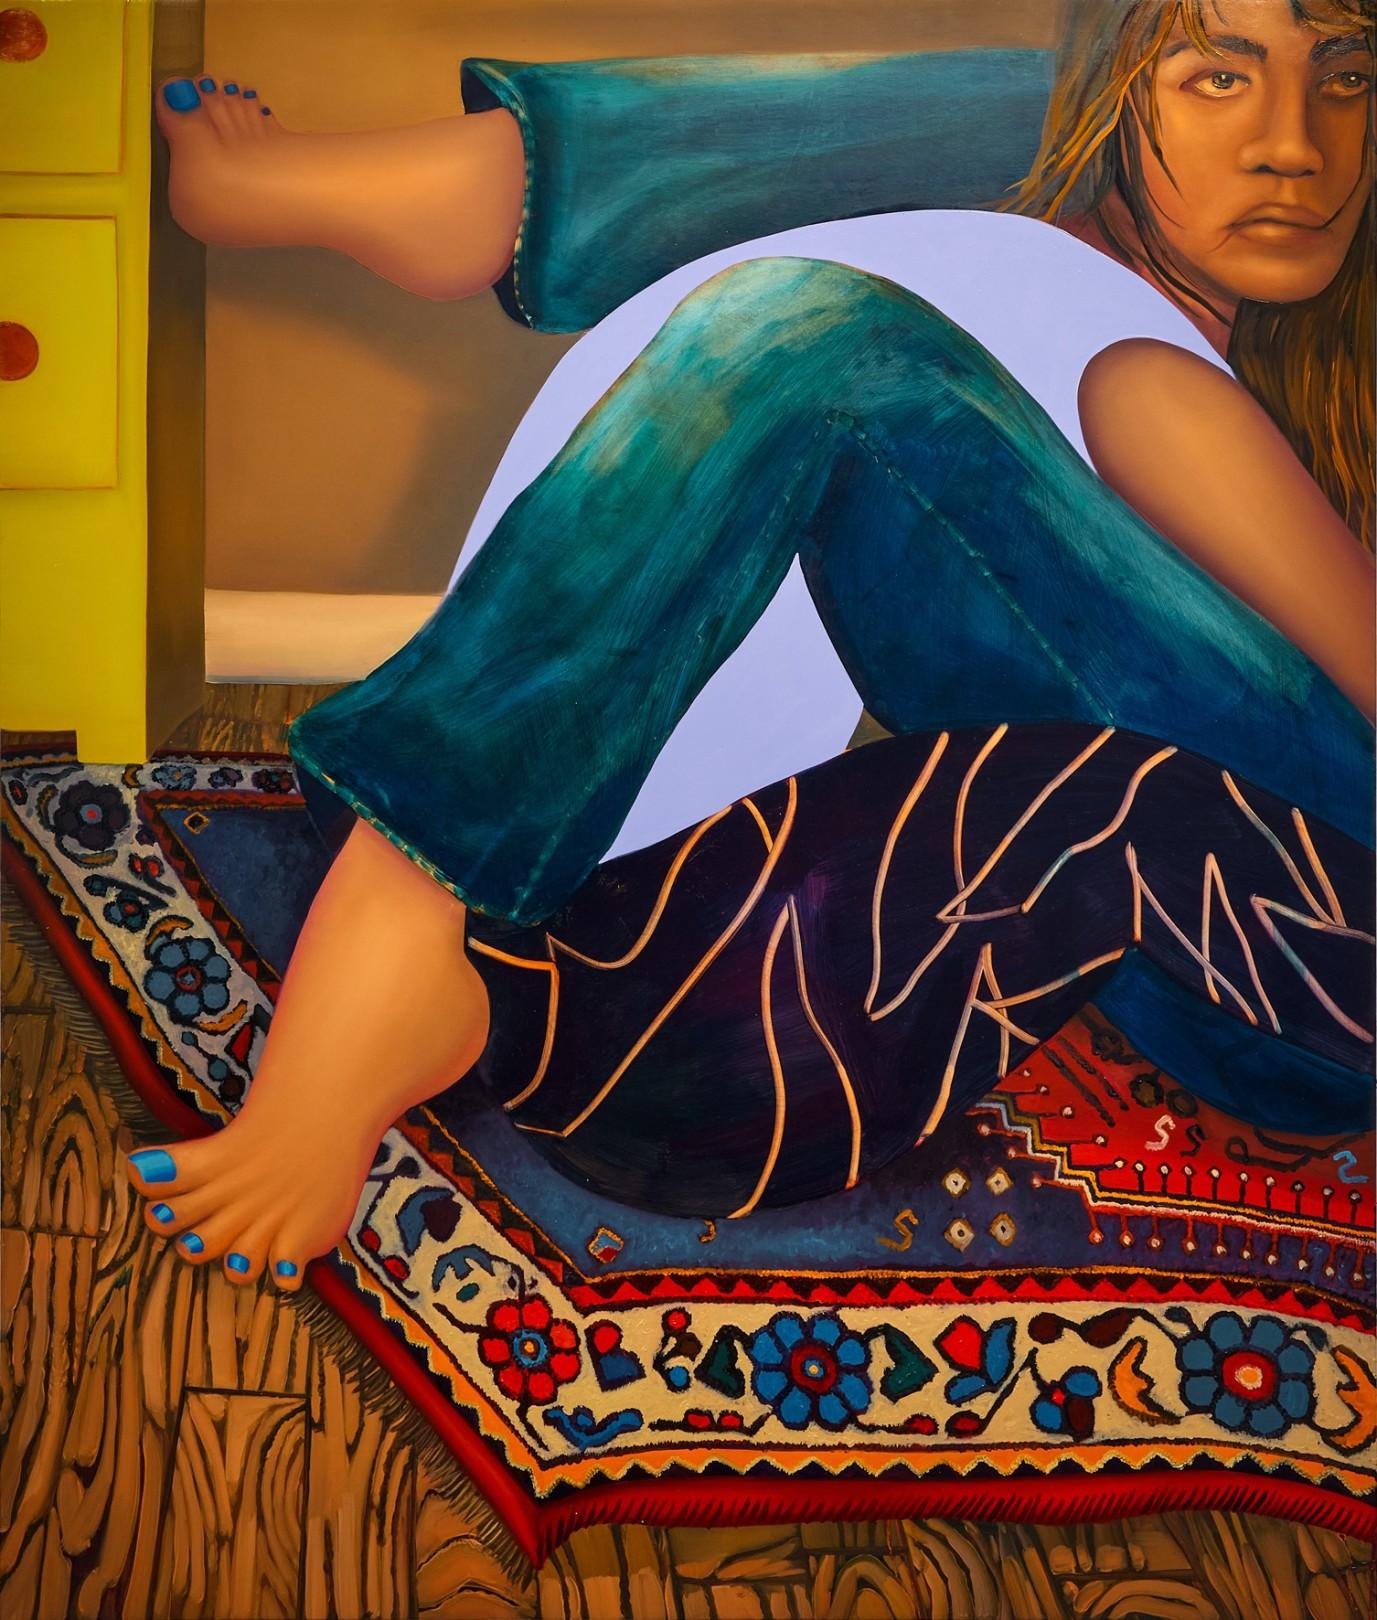 Reflex, 2021 Oil on canvas 137 x 117 cm. / 54 x 46 in.